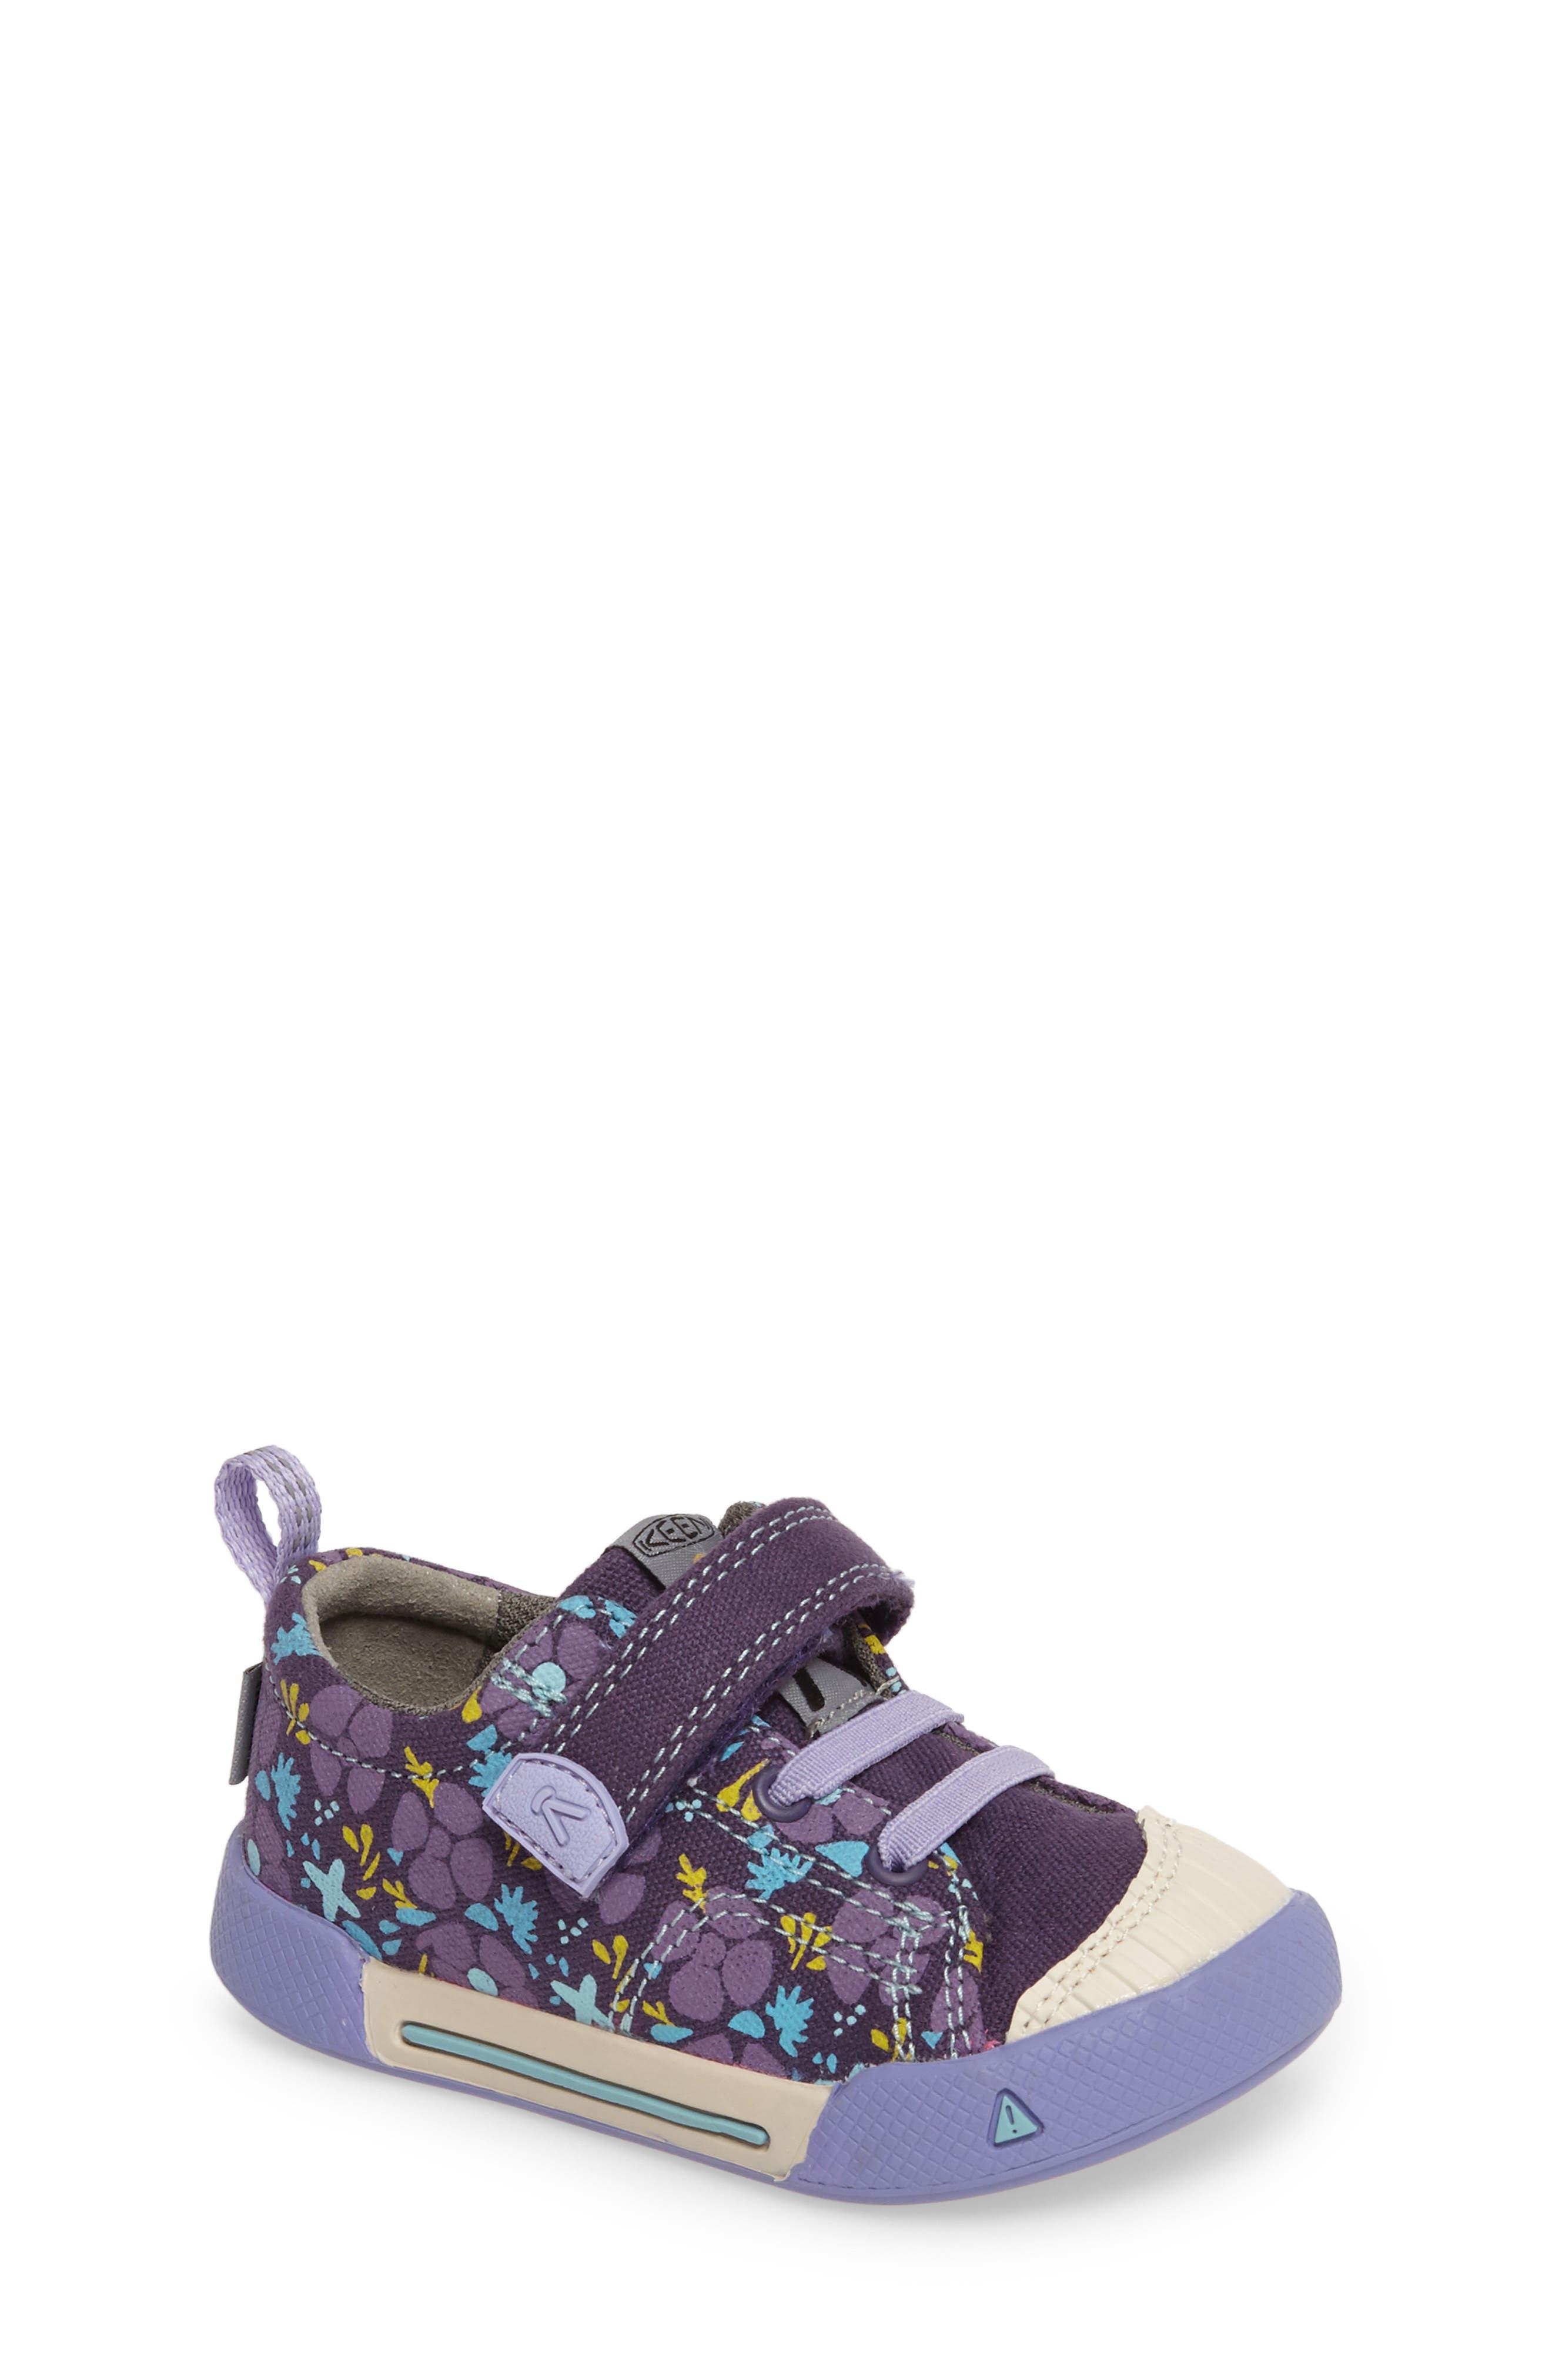 Alternate Image 1 Selected - Keen Encanto Finley Sneaker (Baby, Walker, Toddler, Little Kid & Big Kid)